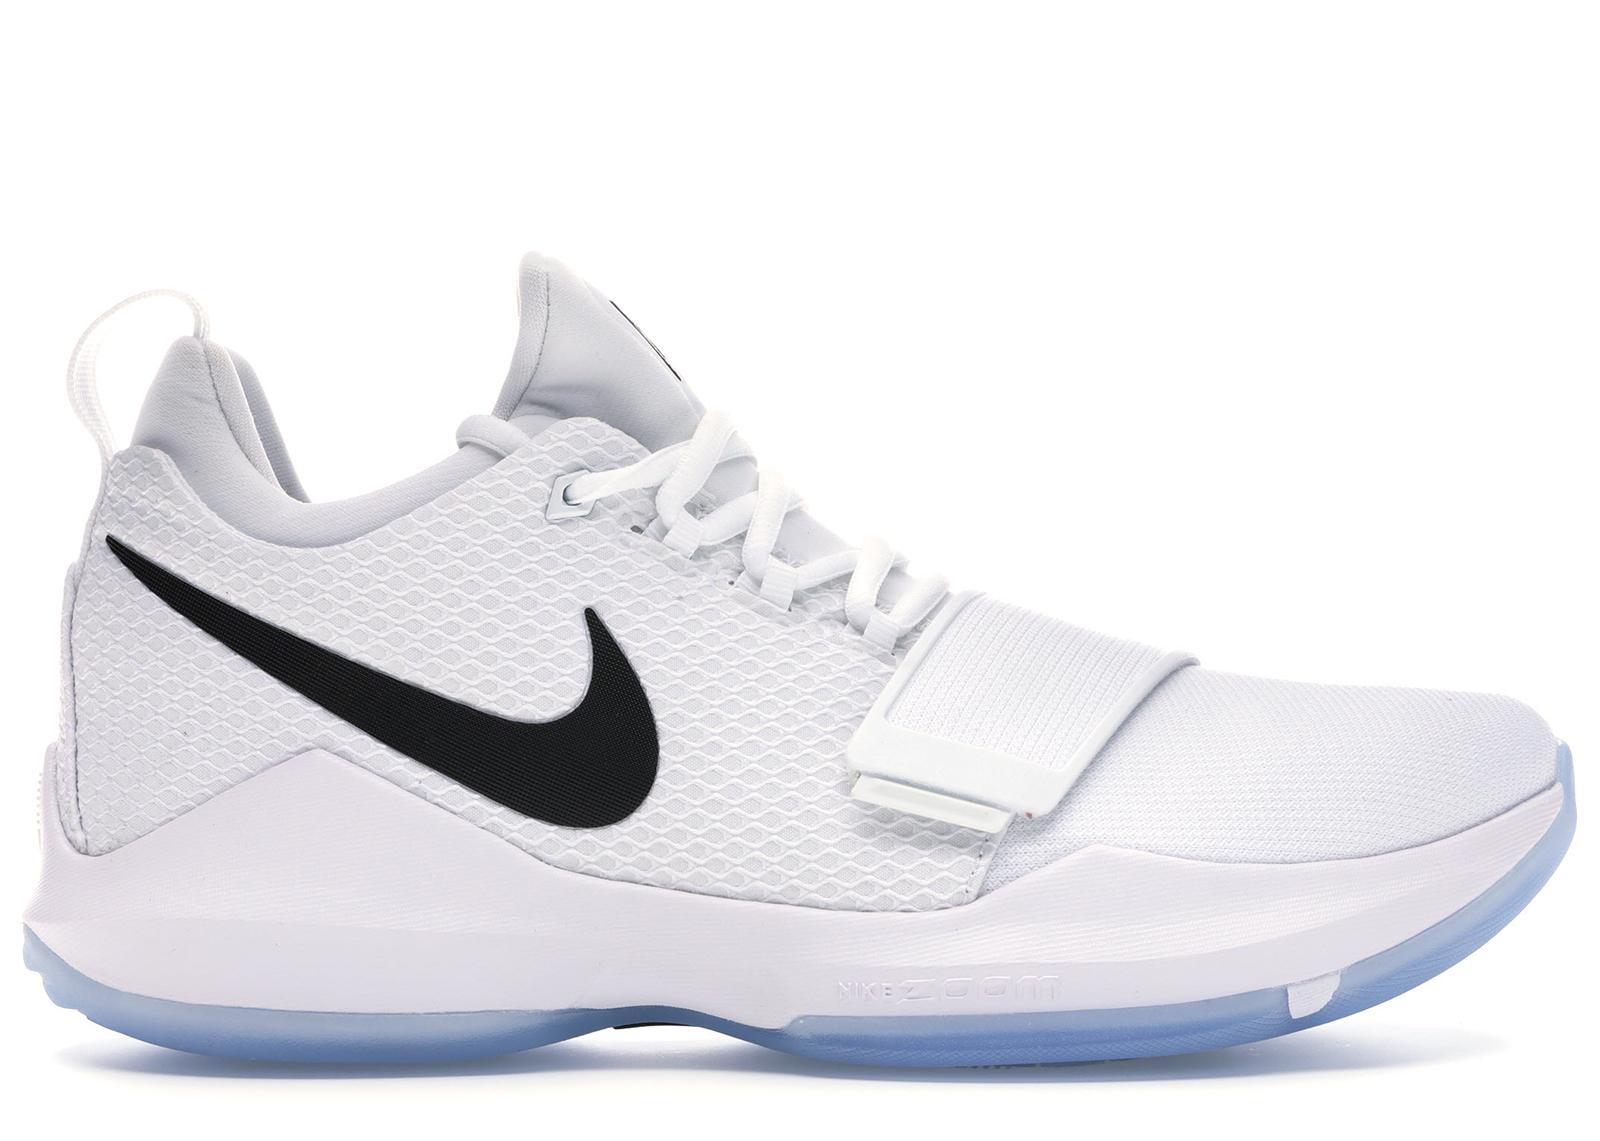 Nike PG 1 White Ice - 878627-100